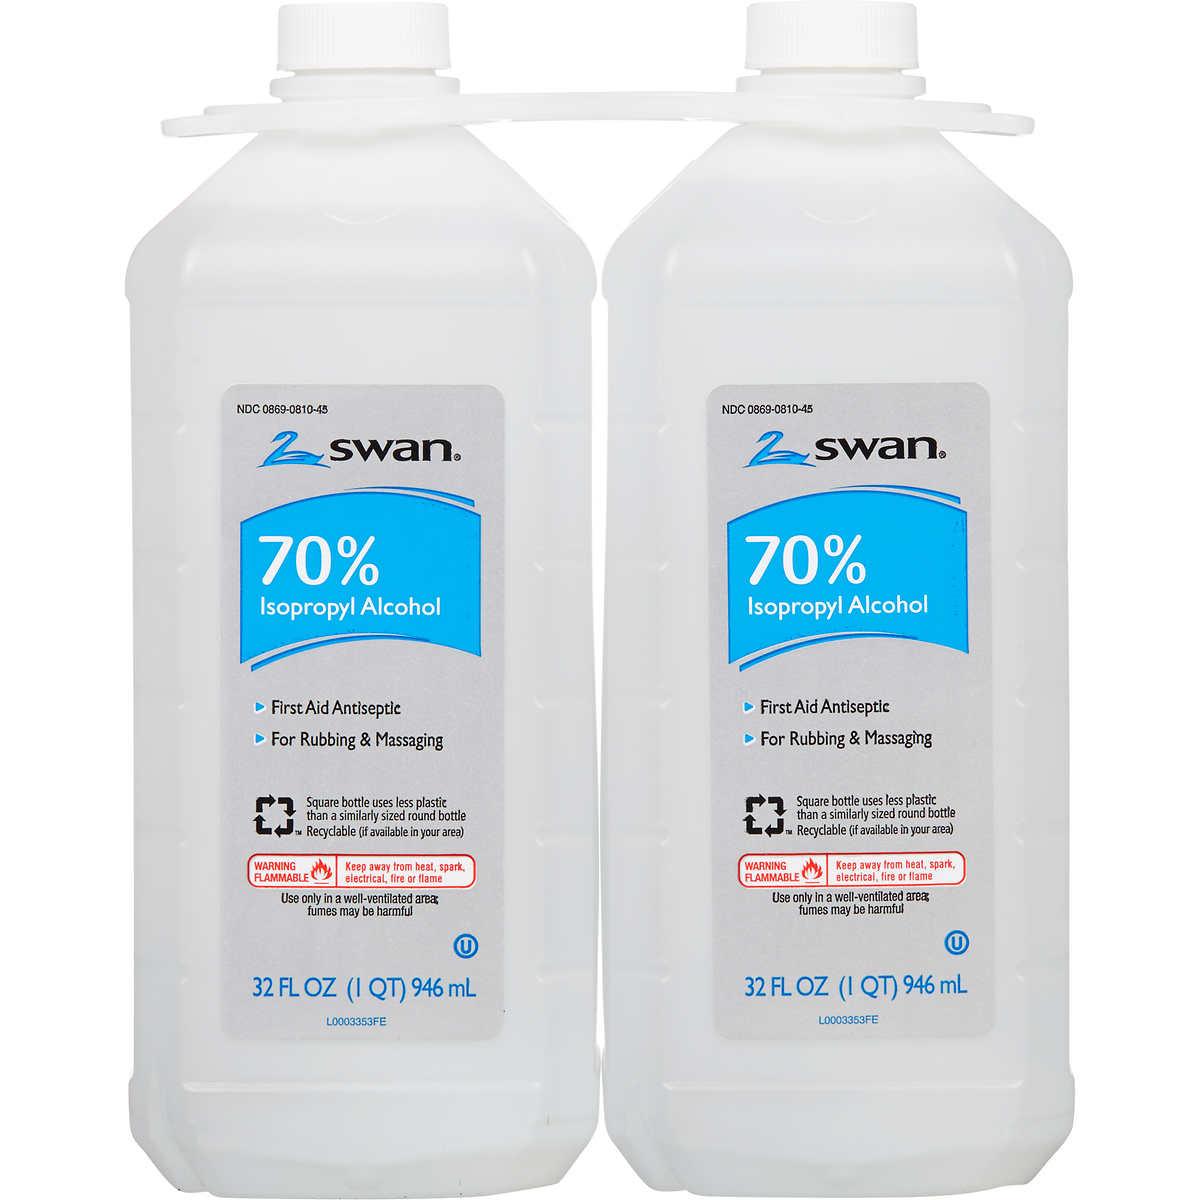 Cumberland Swan 70% Isopropyl Alcohol, 32 oz, 2 ct